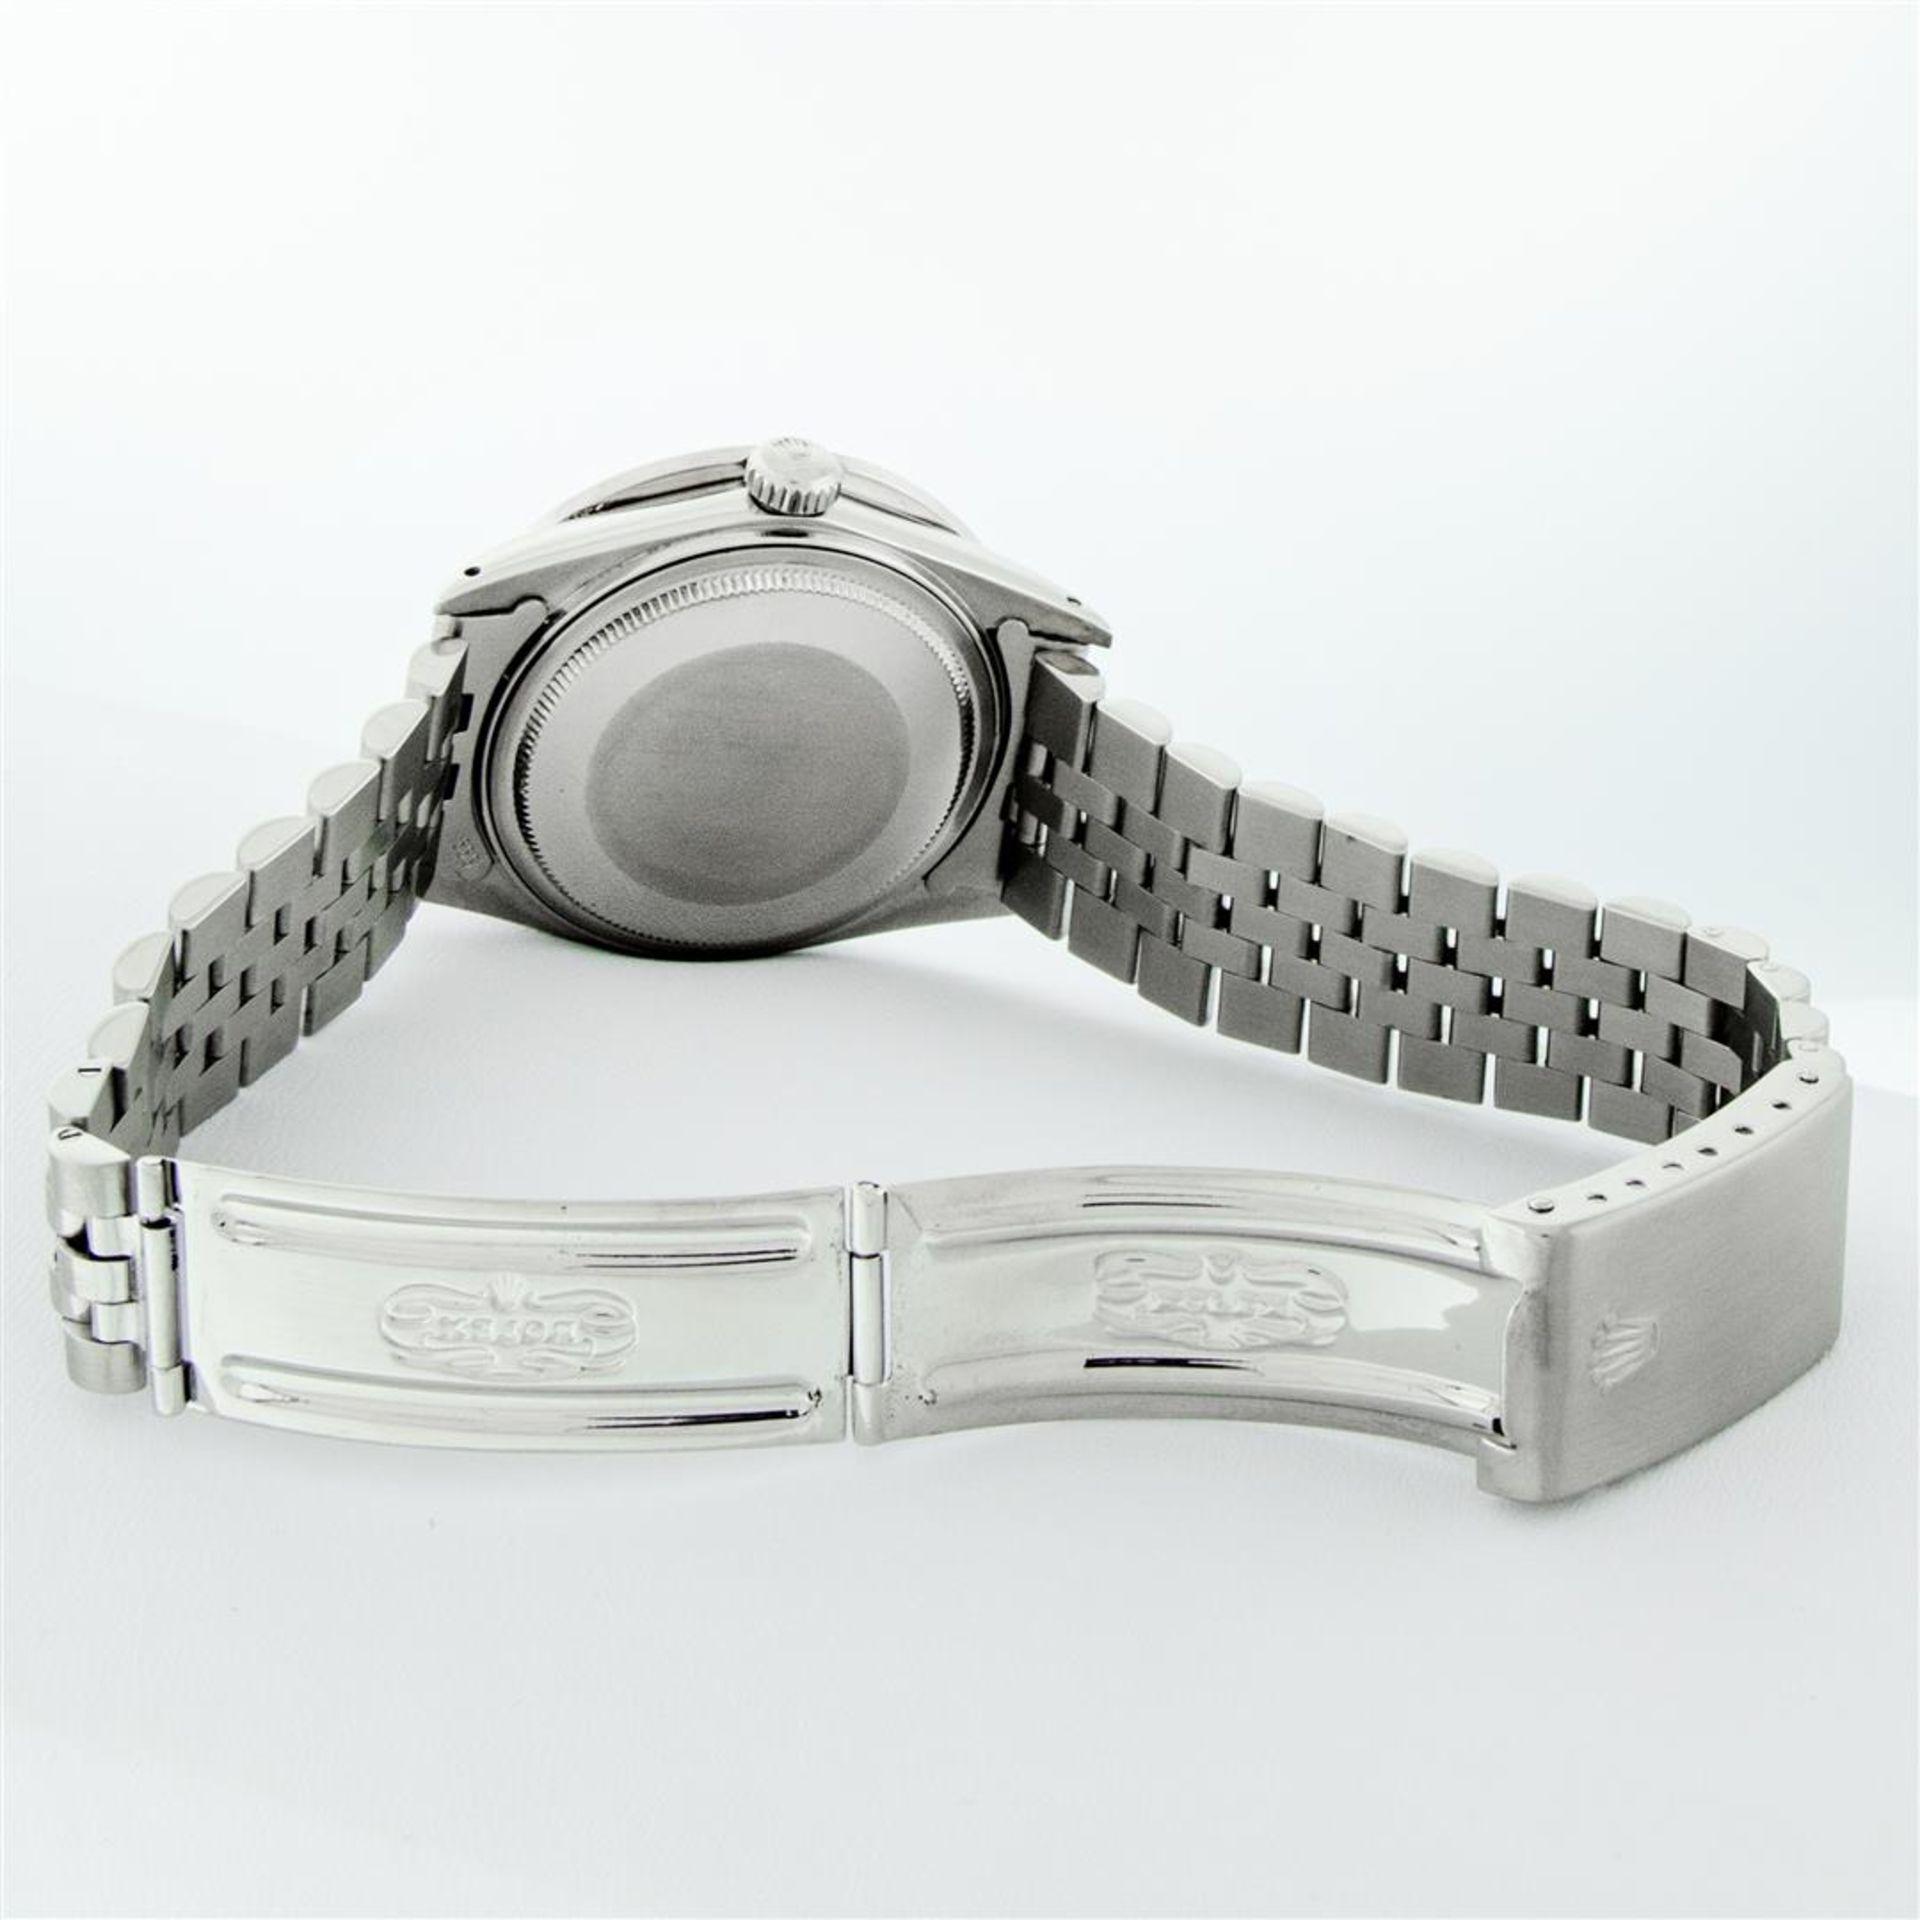 Rolex Mens Stainless Steel Blue Vignette Roman 3ctw Diamond Datejust Wristwatch - Image 9 of 9